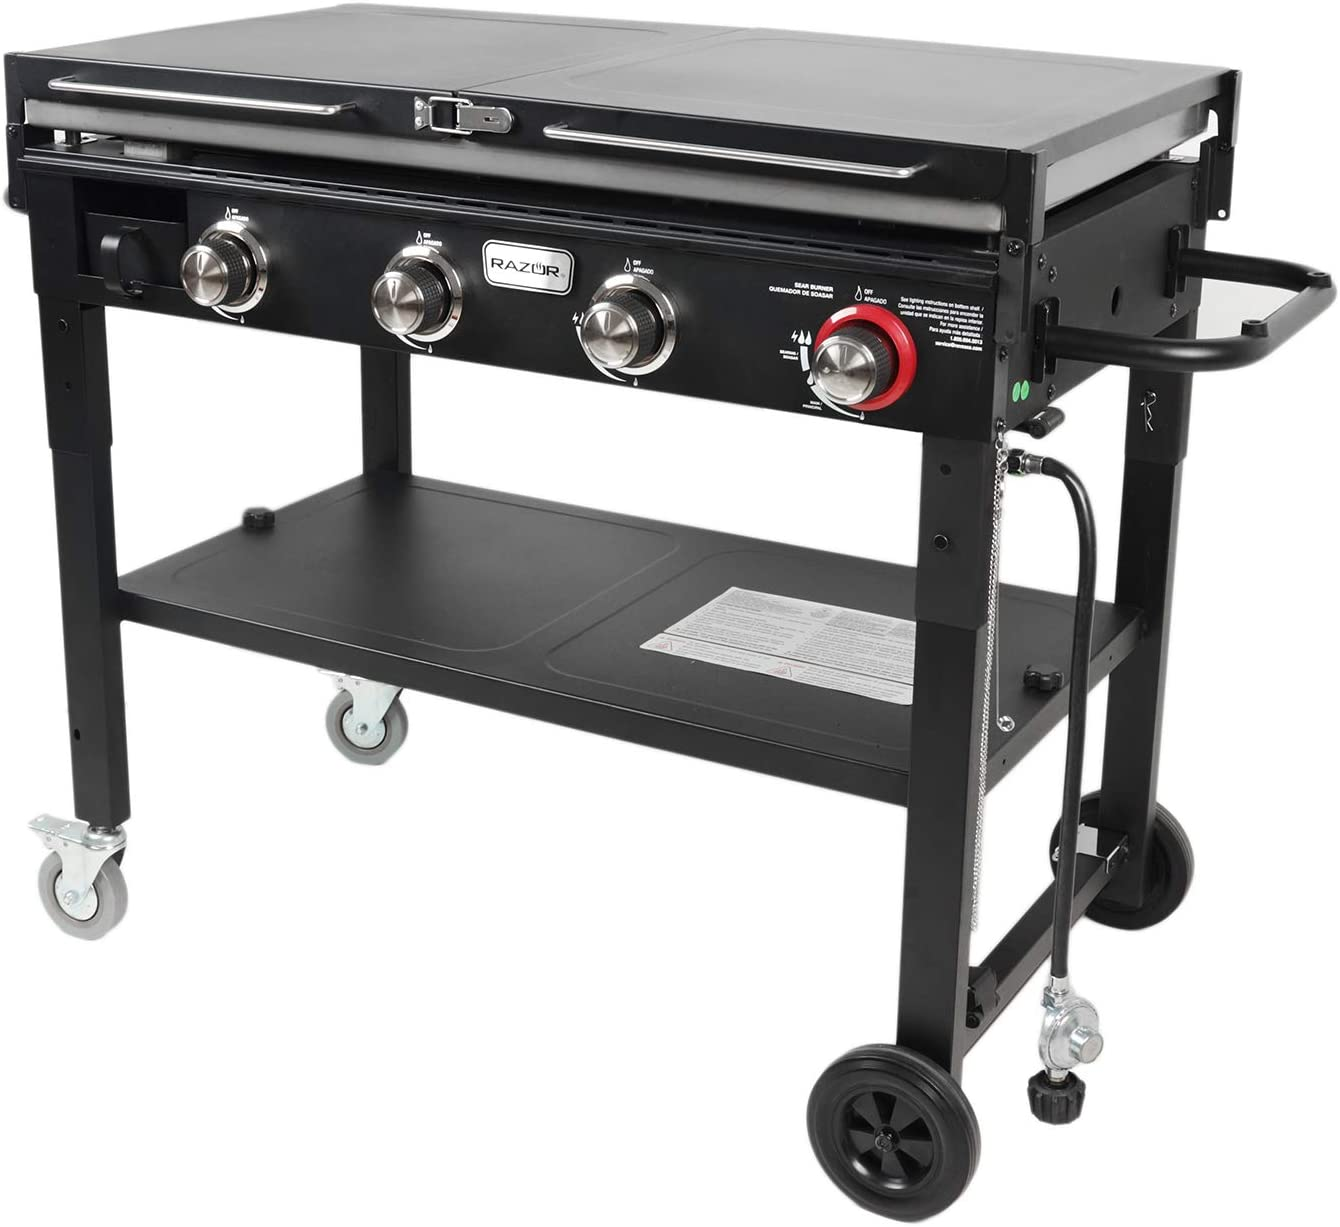 Black Razor Griddle GGC1643M Outdoor Steel 4 Burner Propane Gas Grill Griddle w// Wheels /& Top Cover Lid Folding Shelves for BBQ Cooking